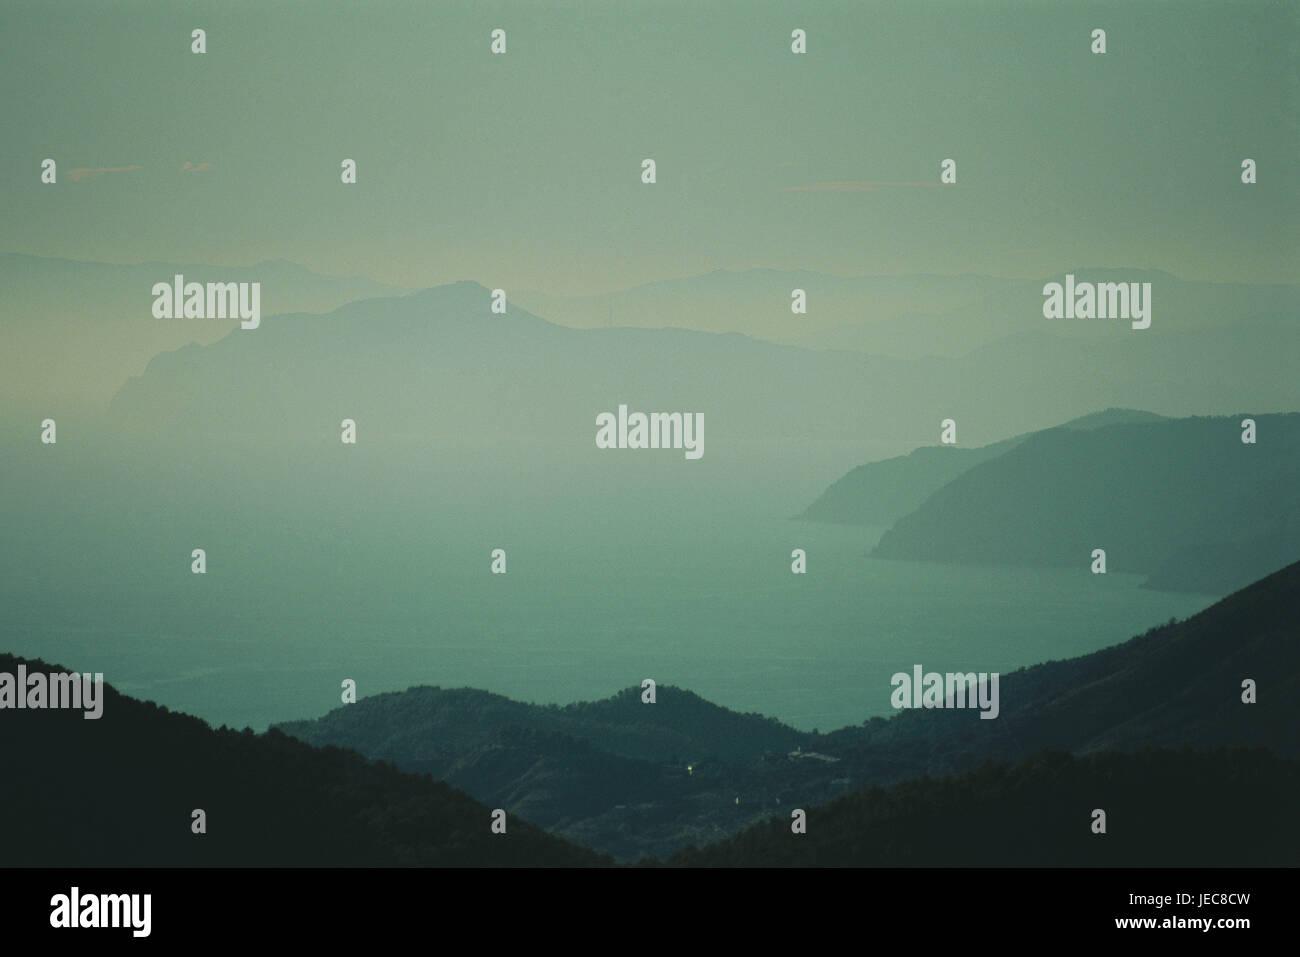 Italien, Cinque Terre, Silhouette, Hügellandschaft, Nebel, Ligurien, Landschaft, Berge, Bergkette, nebulösen Stockbild